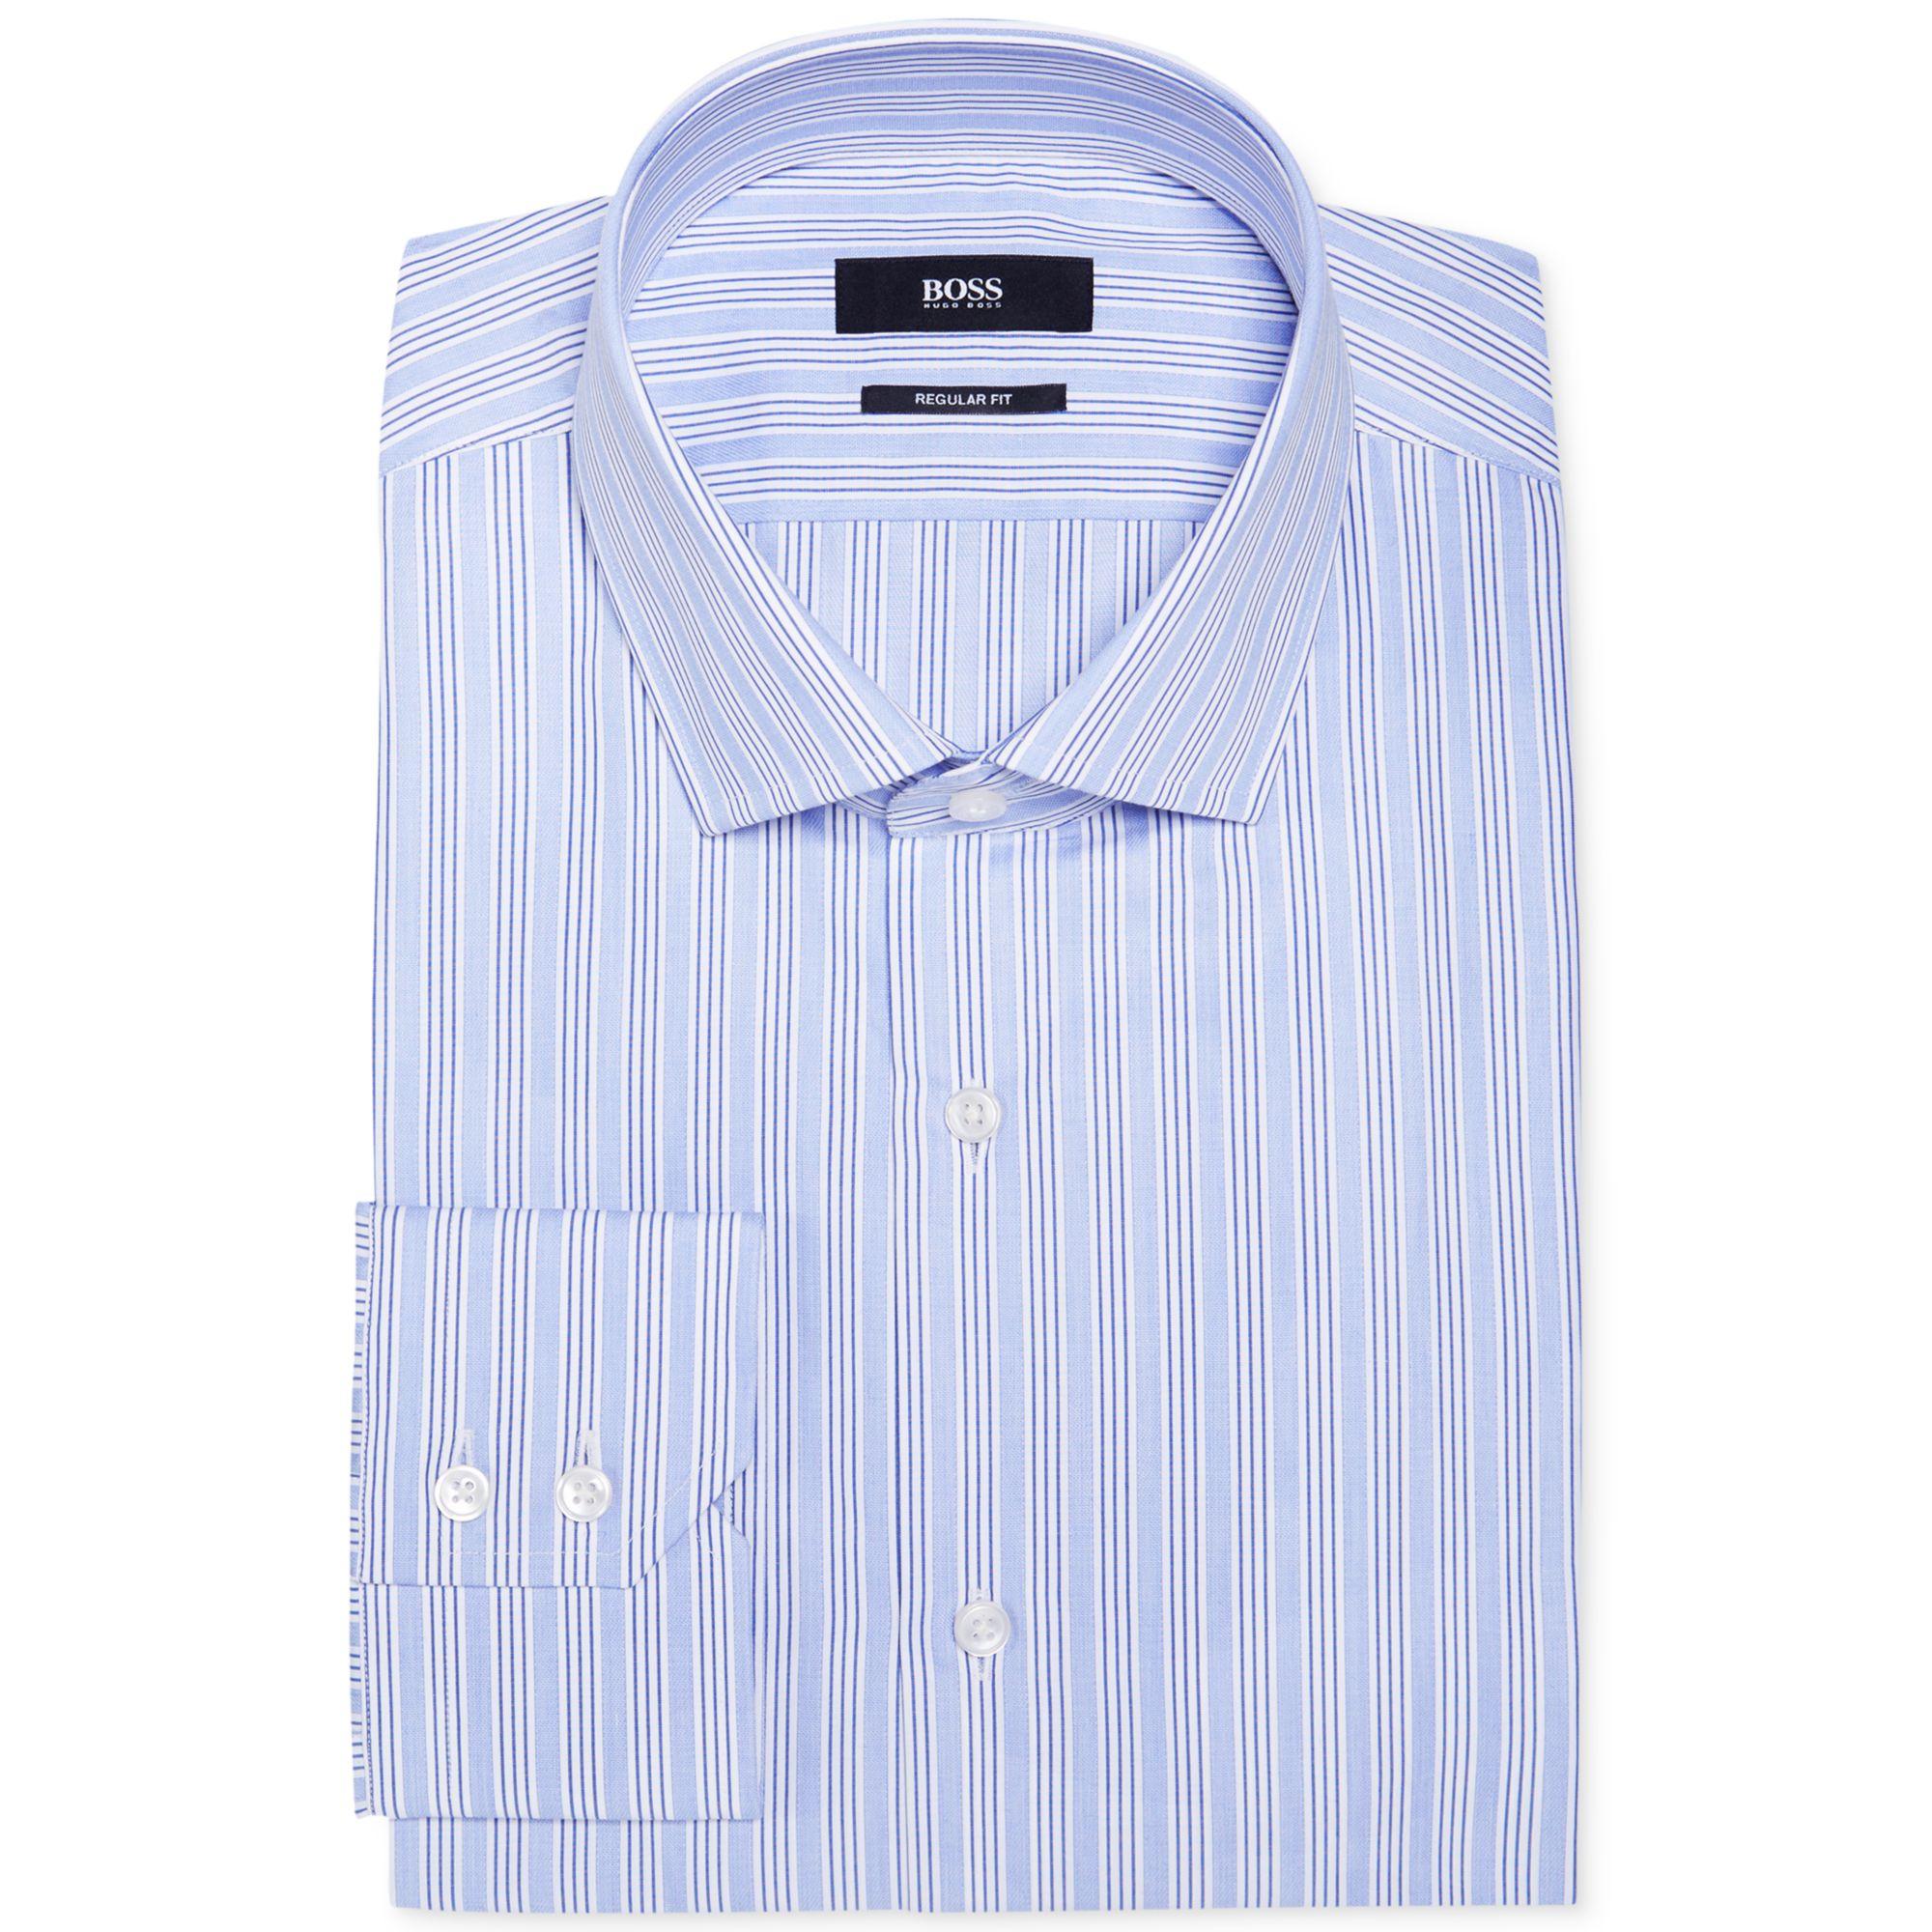 Hugo boss boss blue stripe dress shirt in blue for men lyst for Hugo boss dress shirt review